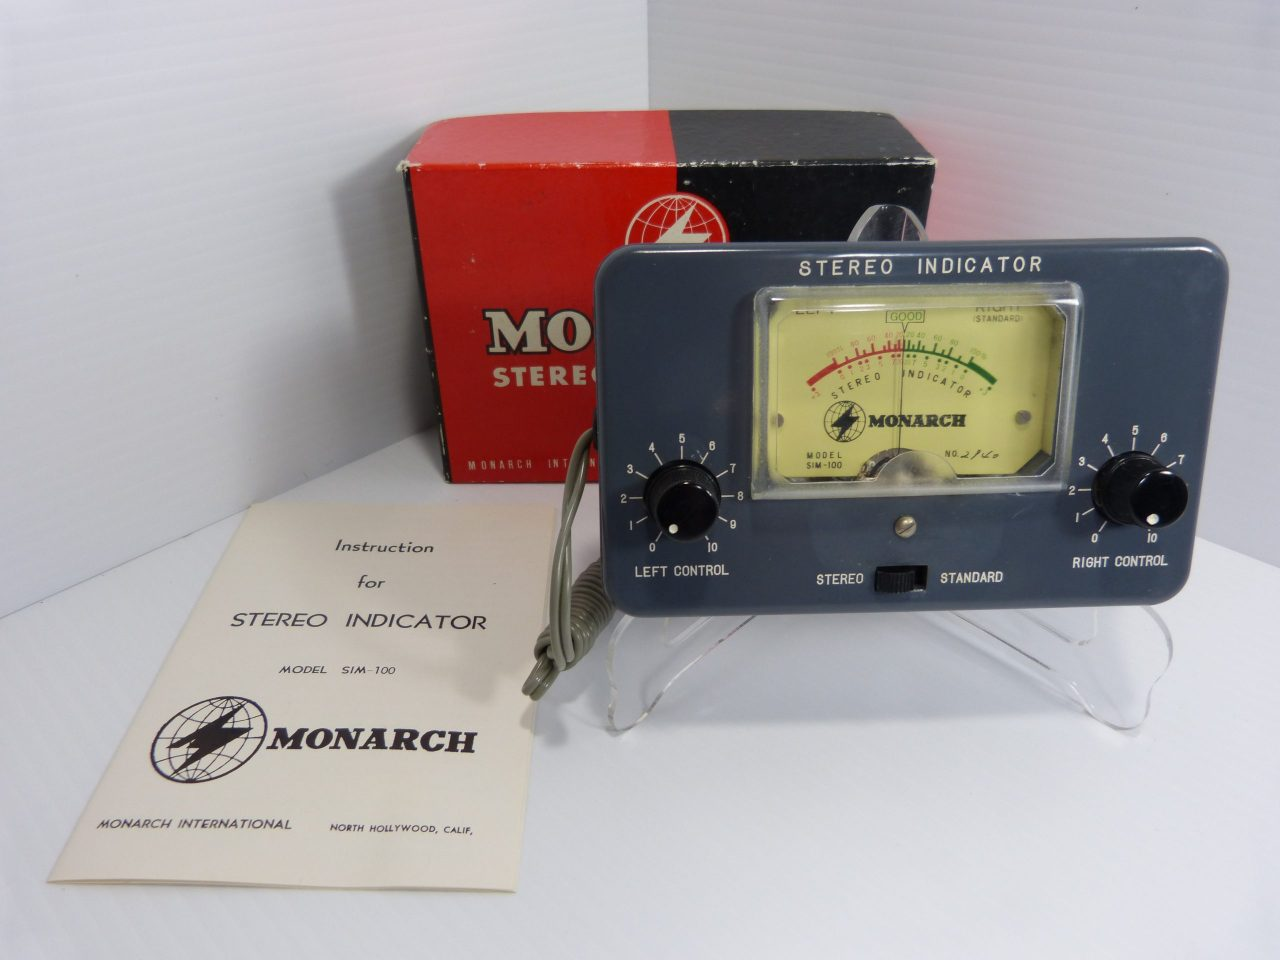 Monarch Stereo Indicator Model SIM-100